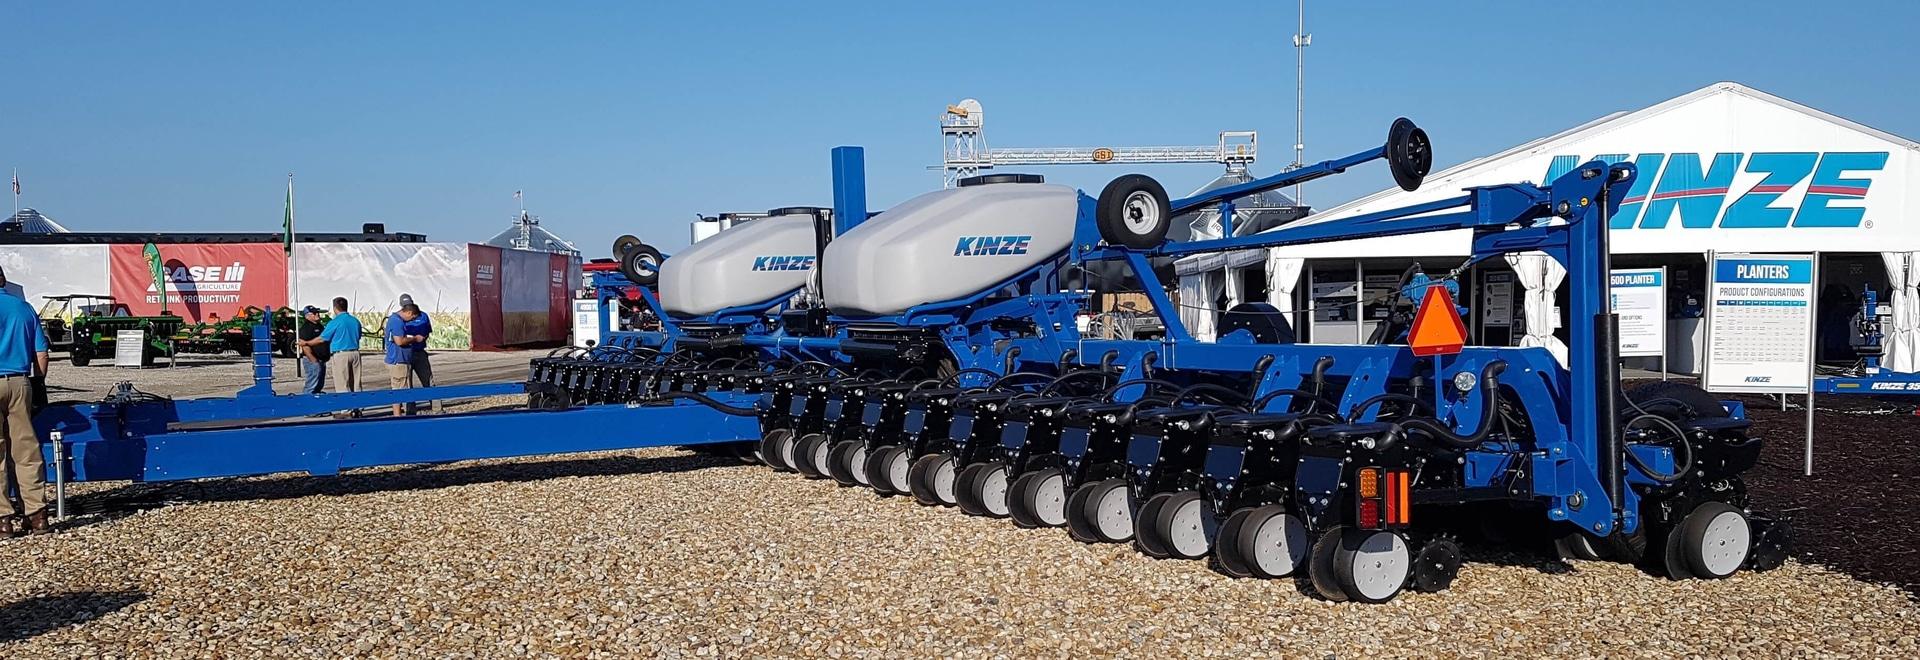 Kinze Introduces Prototype Split Row 60 Foot Planter Decatur Il Usa